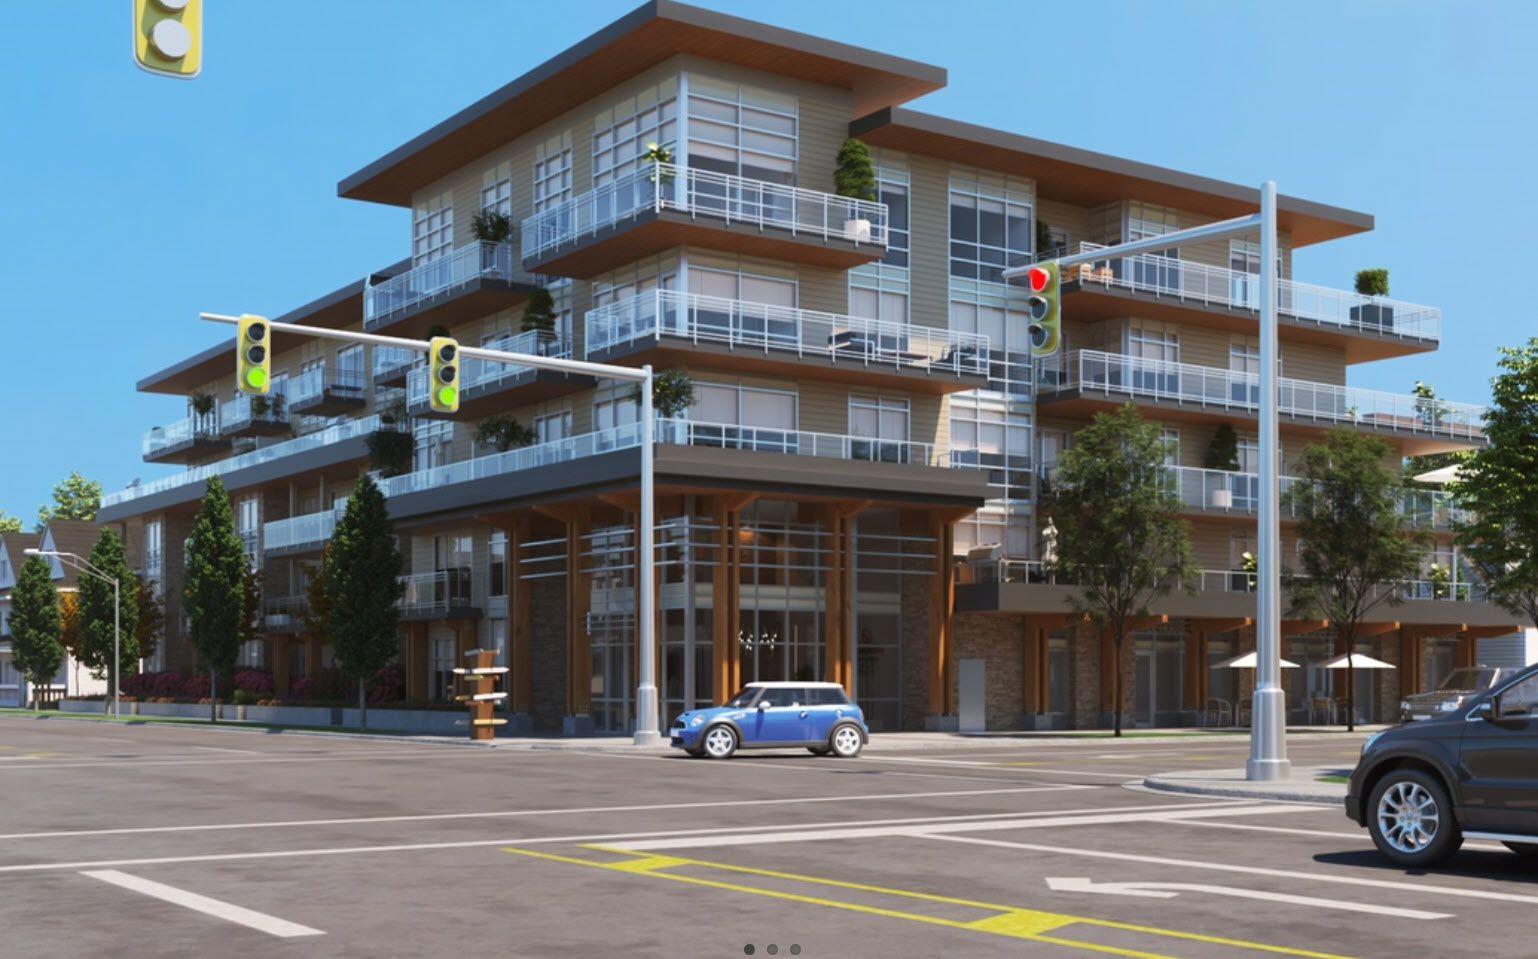 Main Photo: 204 14022 North Bluff: White Rock Condo for lease (South Surrey White Rock)